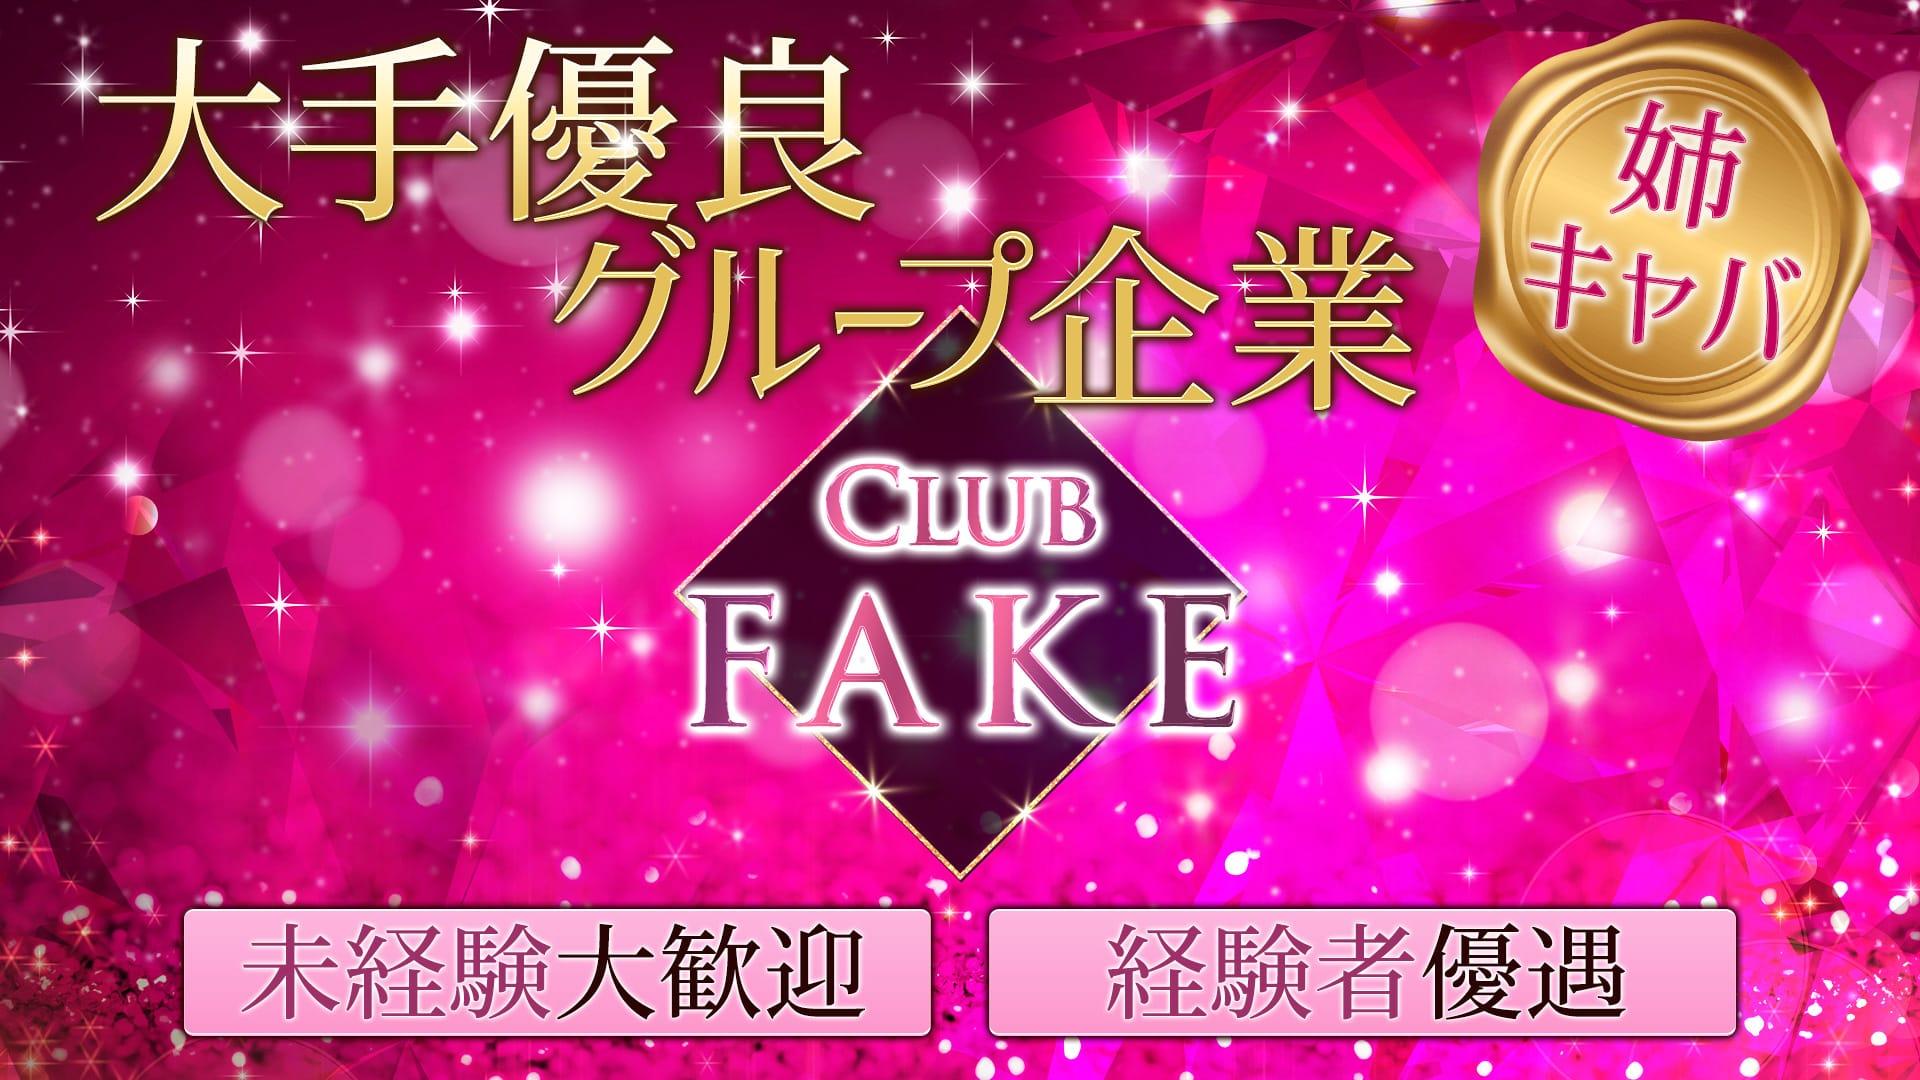 Club FAKE(フェイク) 本厚木姉キャバ・半熟キャバ TOP画像